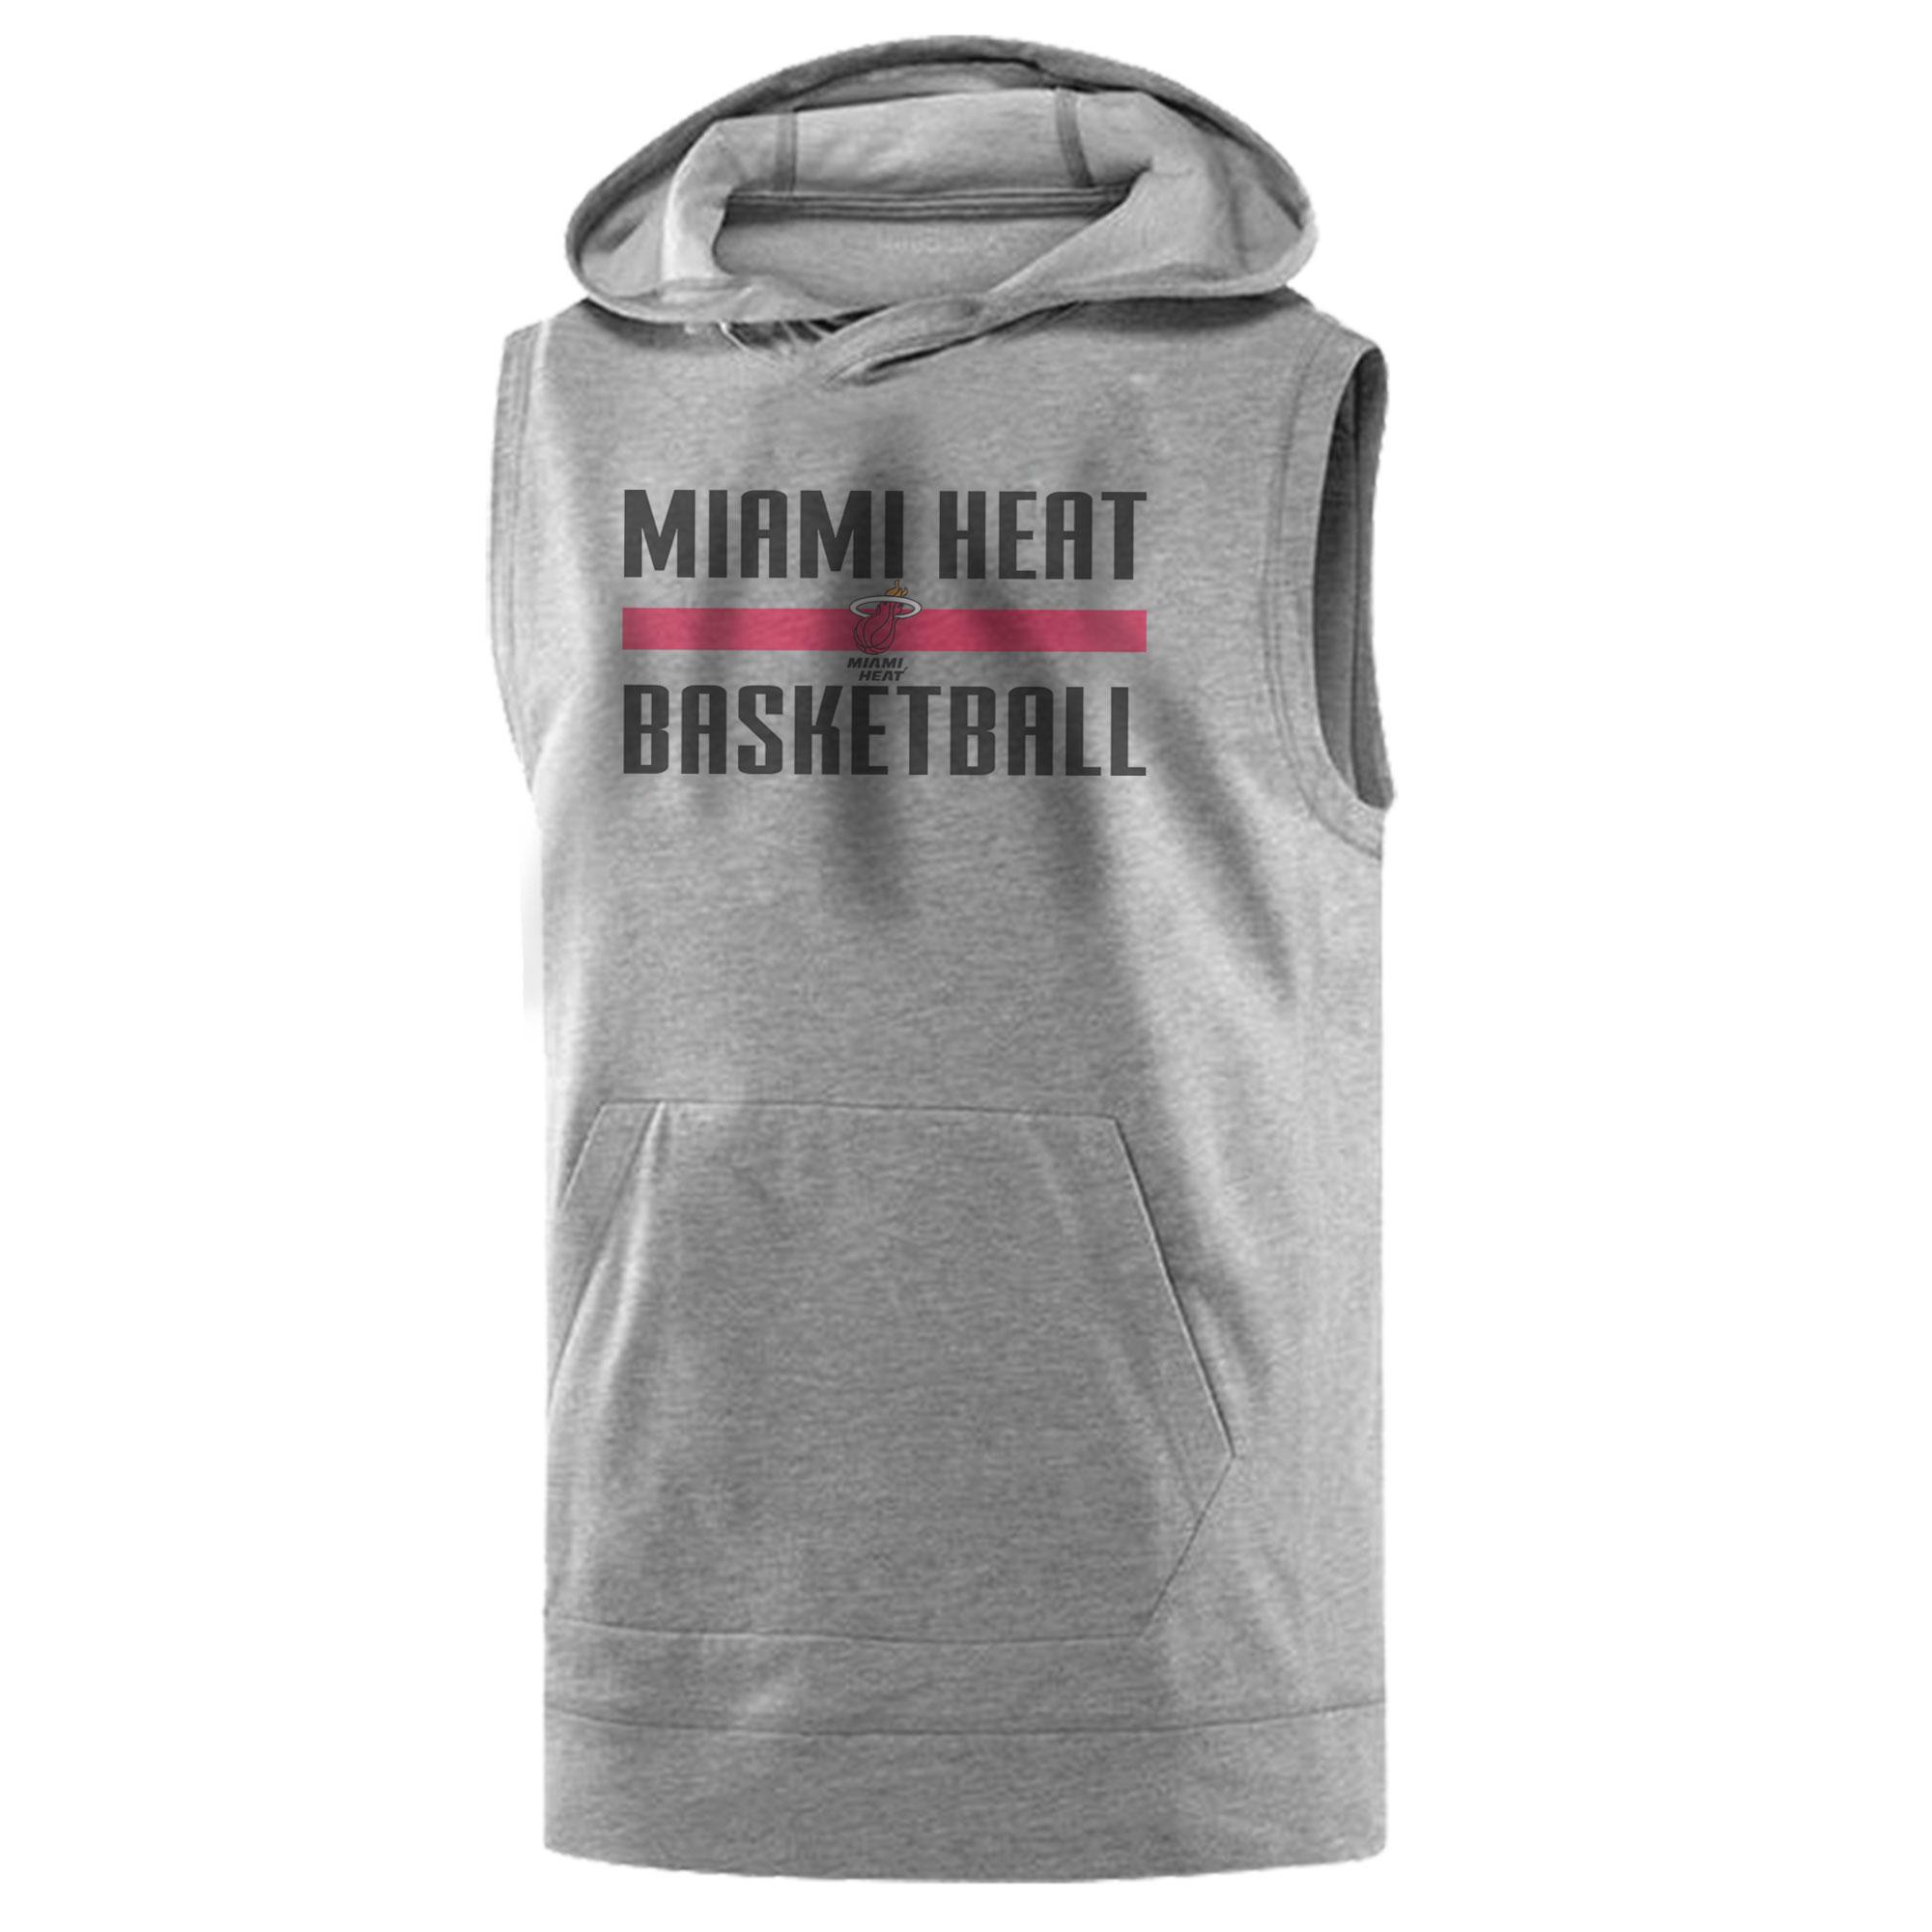 Miami Heat Basketball Sleeveless (KLS-GRY-NP-miami-bsktbll-528)